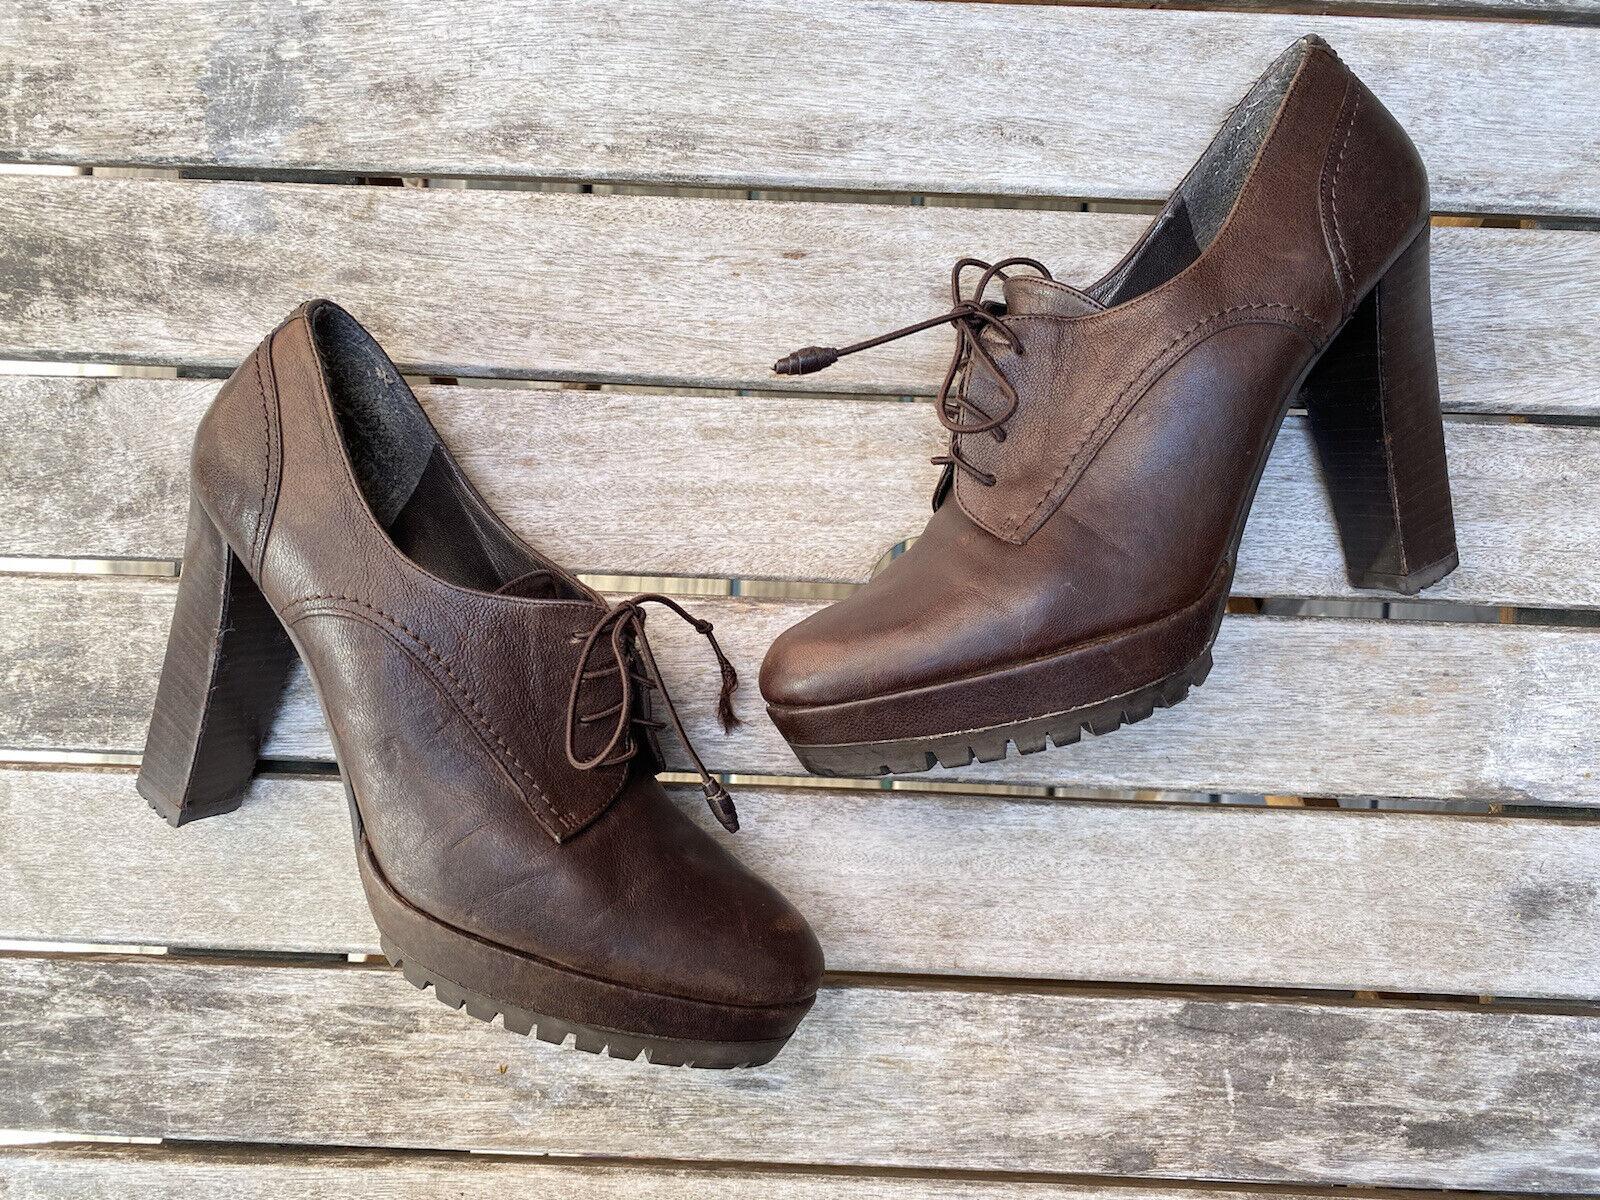 Stuart Weitzman Brown Lace Up Oxford Platform Booties Ankle Boots Shoes